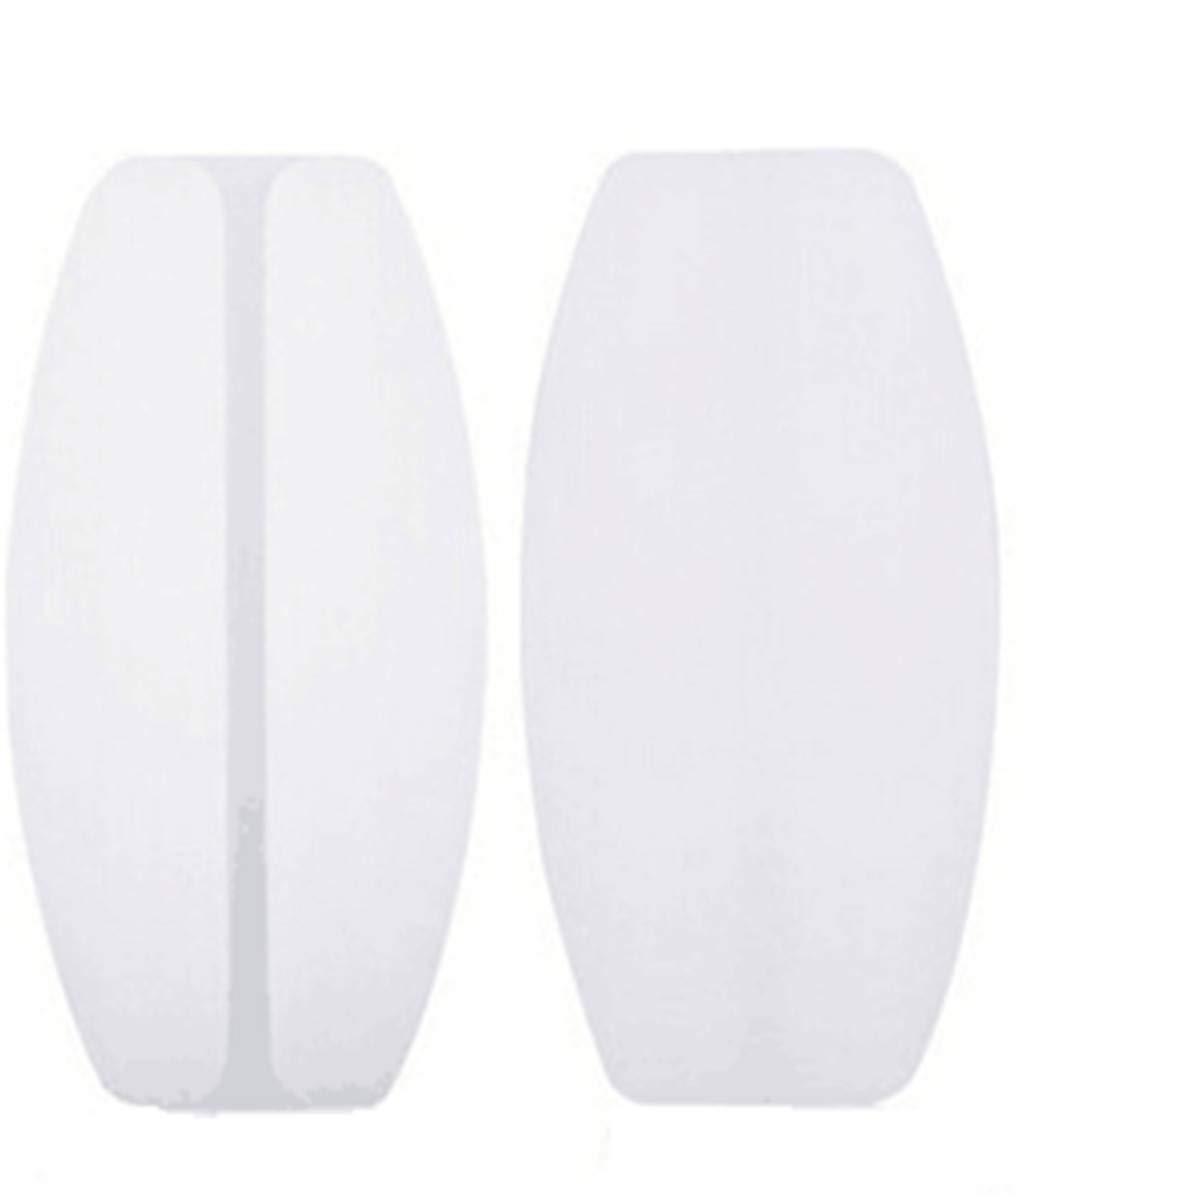 Silicone Bra Strap Cushions Soft Holder Non-slip Shoulder Protectors Pads, 2PC TM